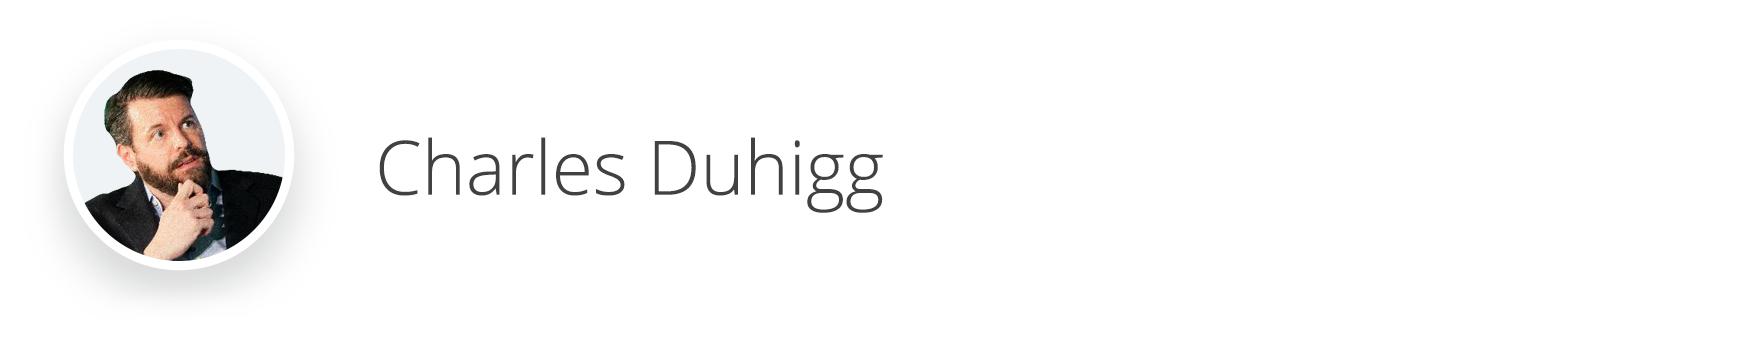 Charles Duhigg, Habits and Behaviors